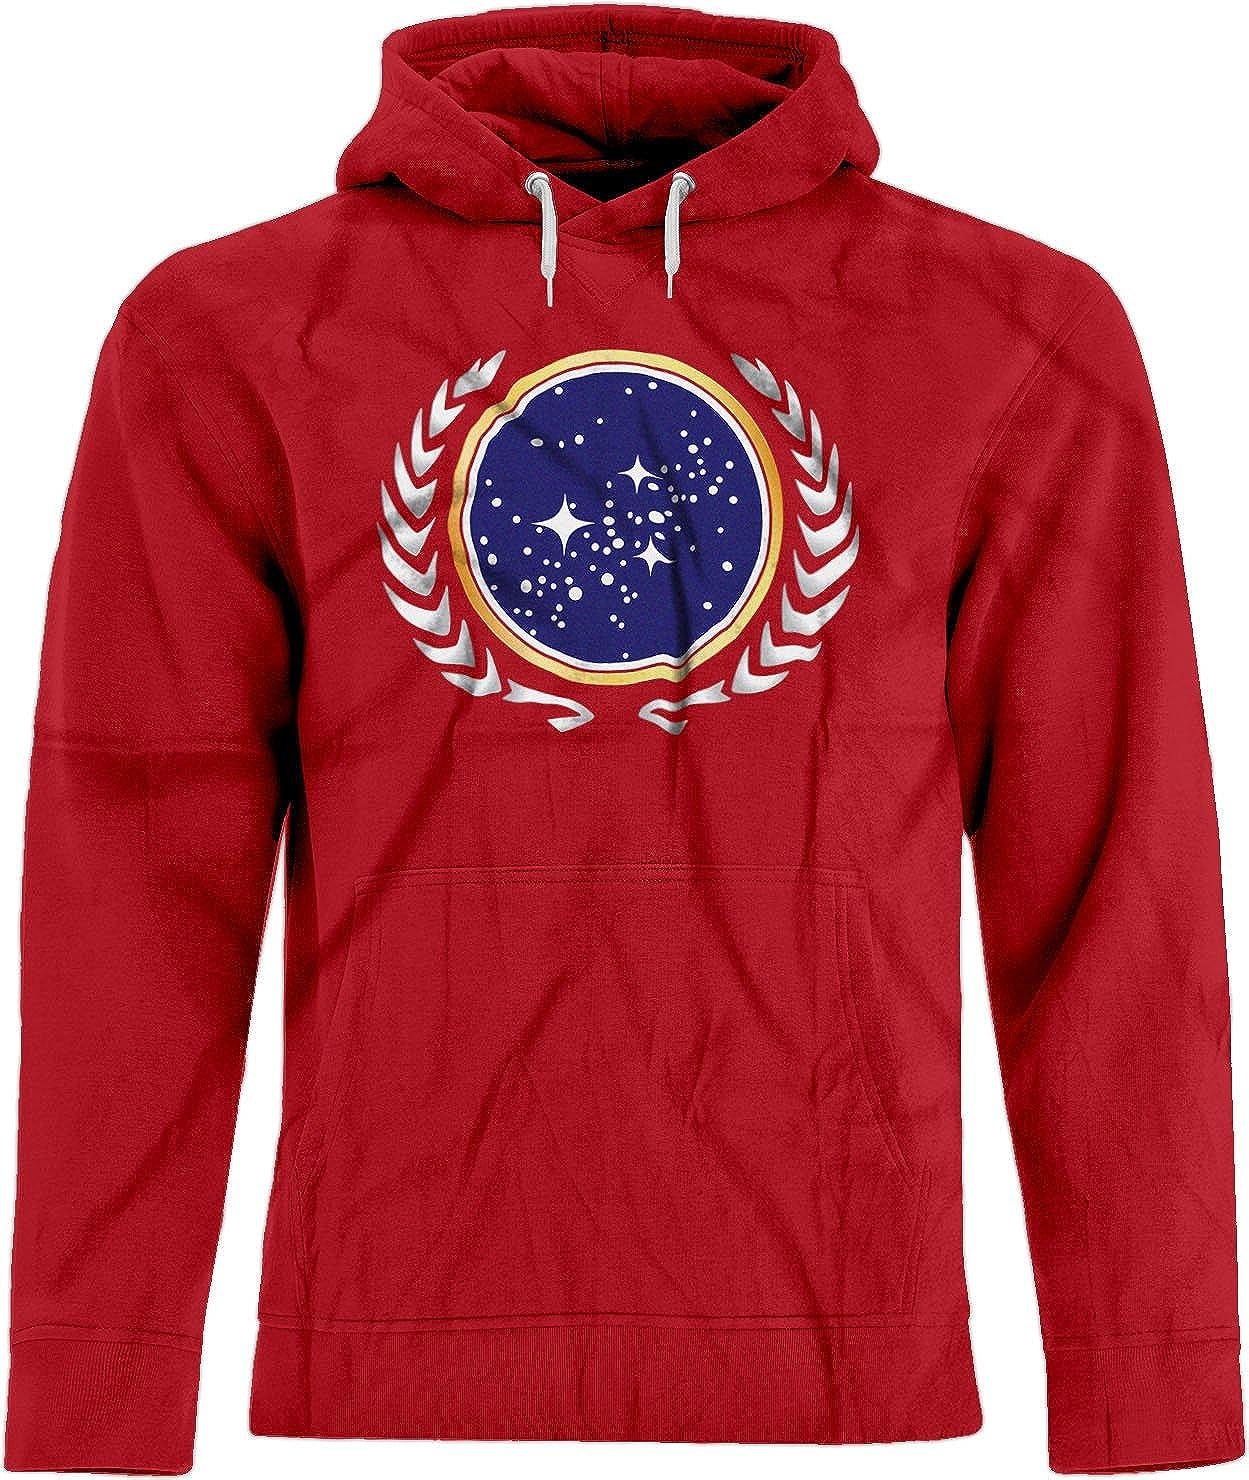 BSW Unisex Star Trek United Federation of Planets Logo Premium Hoodie 5372-1HP